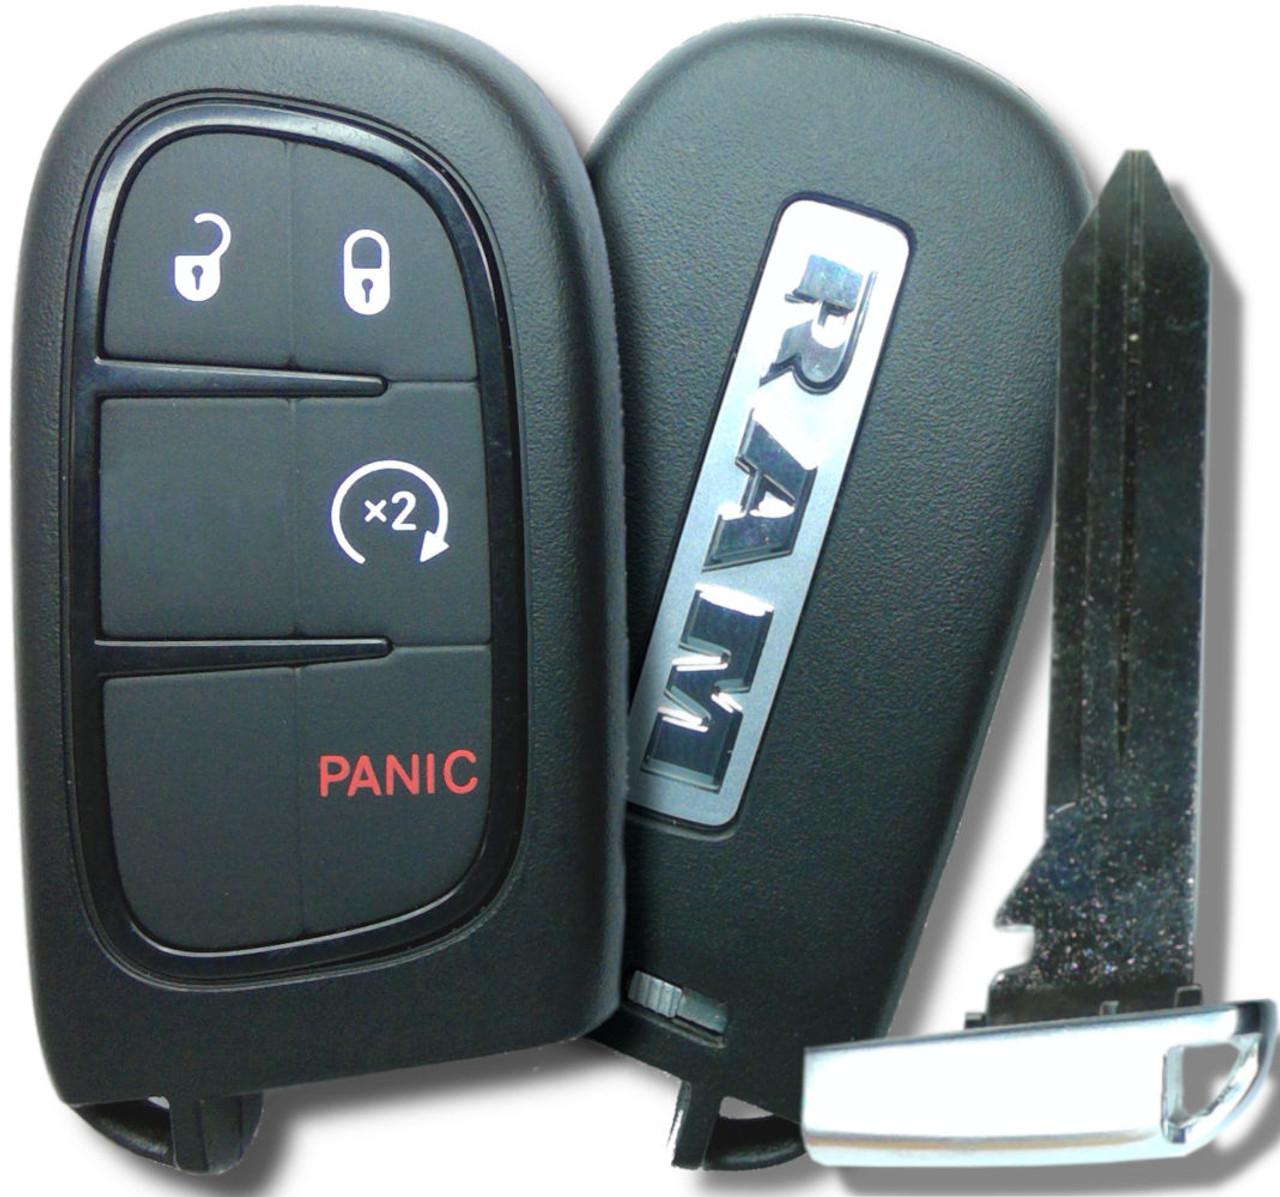 RAM Ram 1500 , Ram 3500 , Ram 2500 56046956 GQ4-54T 1470A-35T Key - Prox Smart